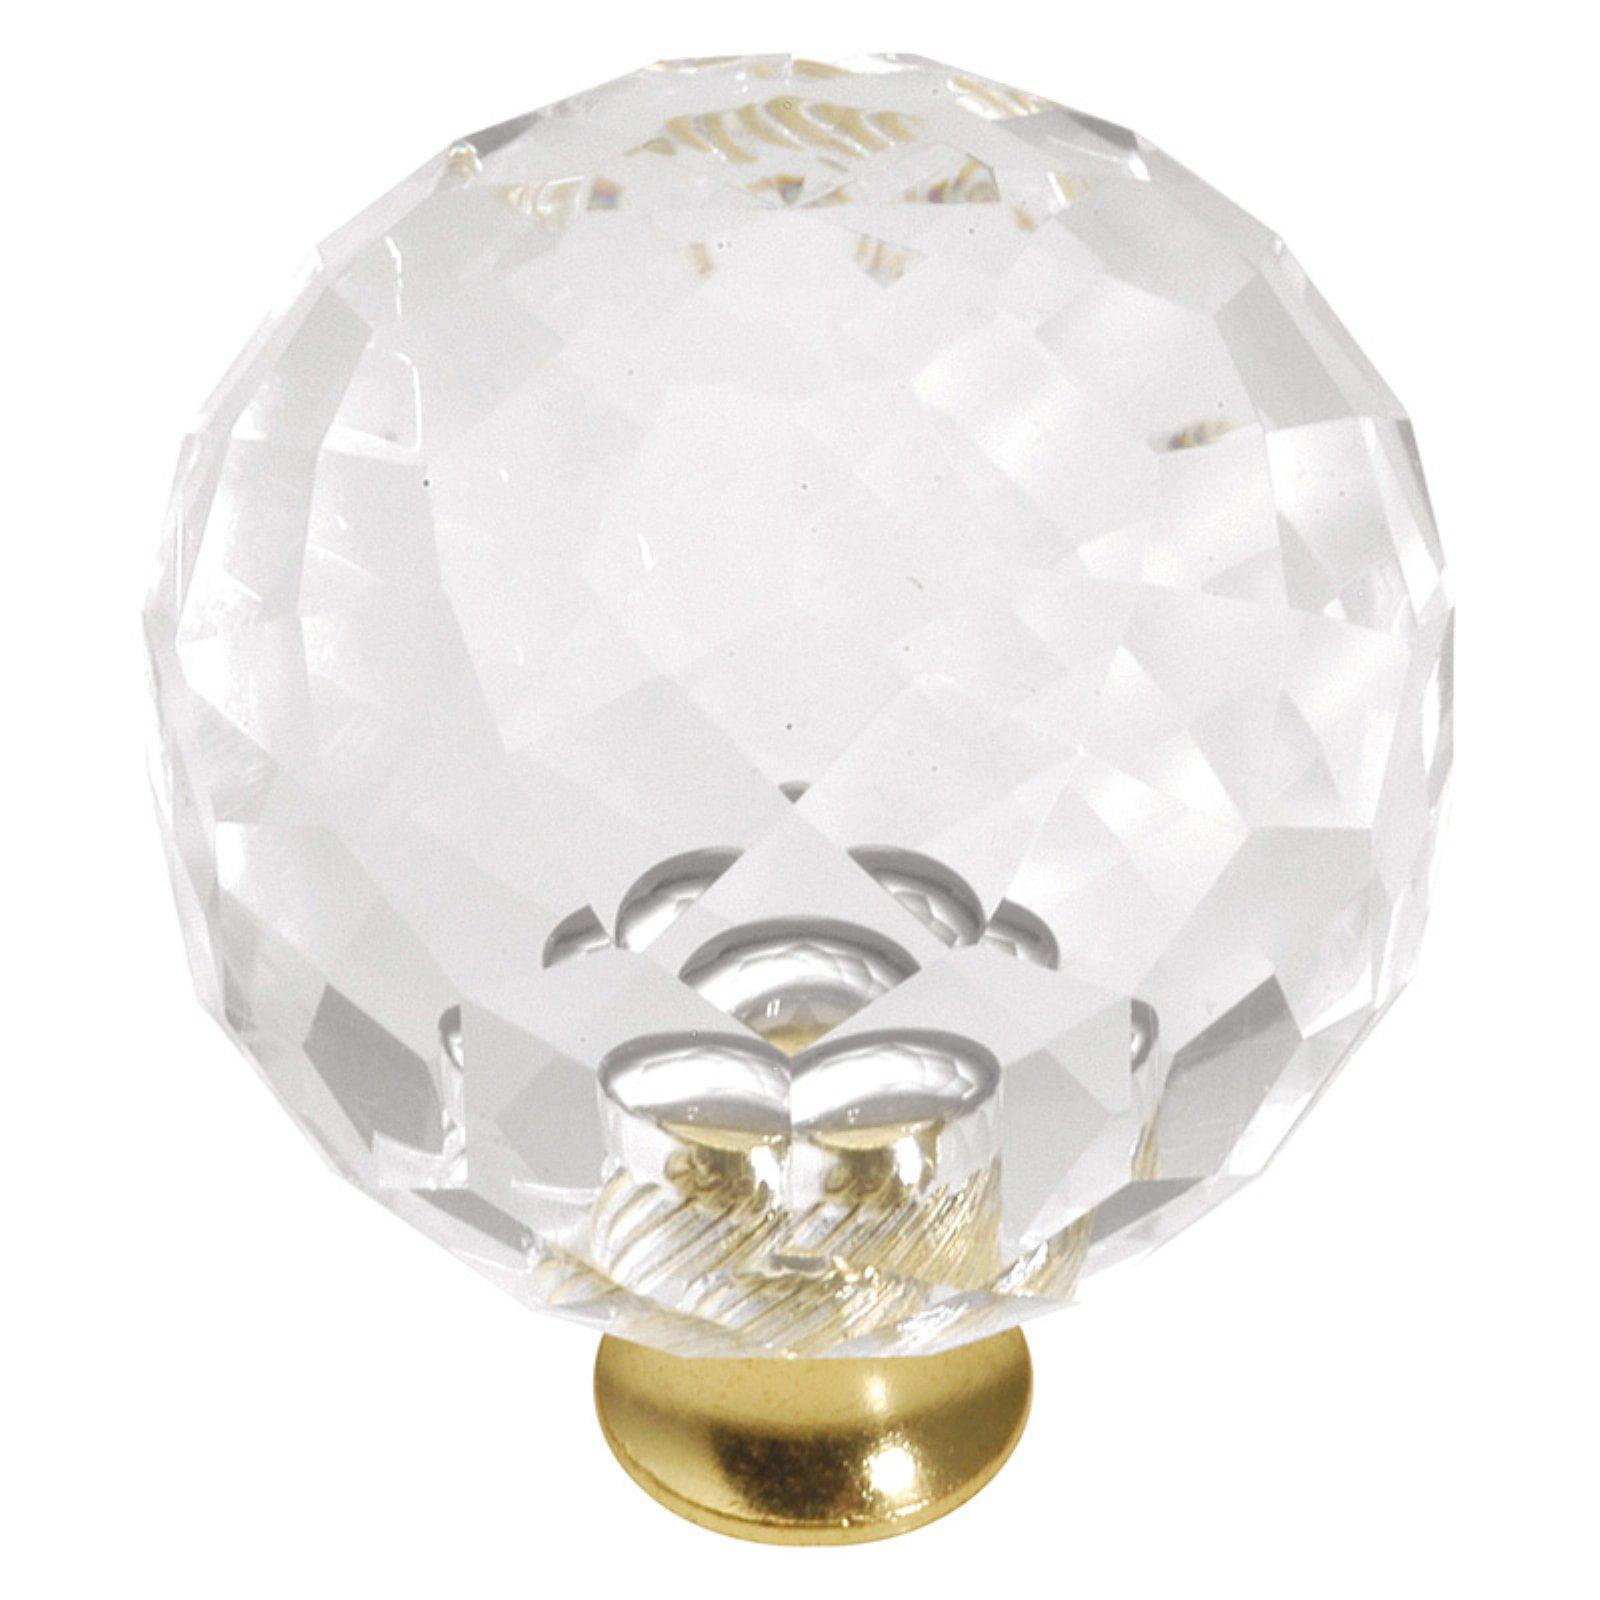 Hickory Hardware Crystal Palace Round Cabinet Knob